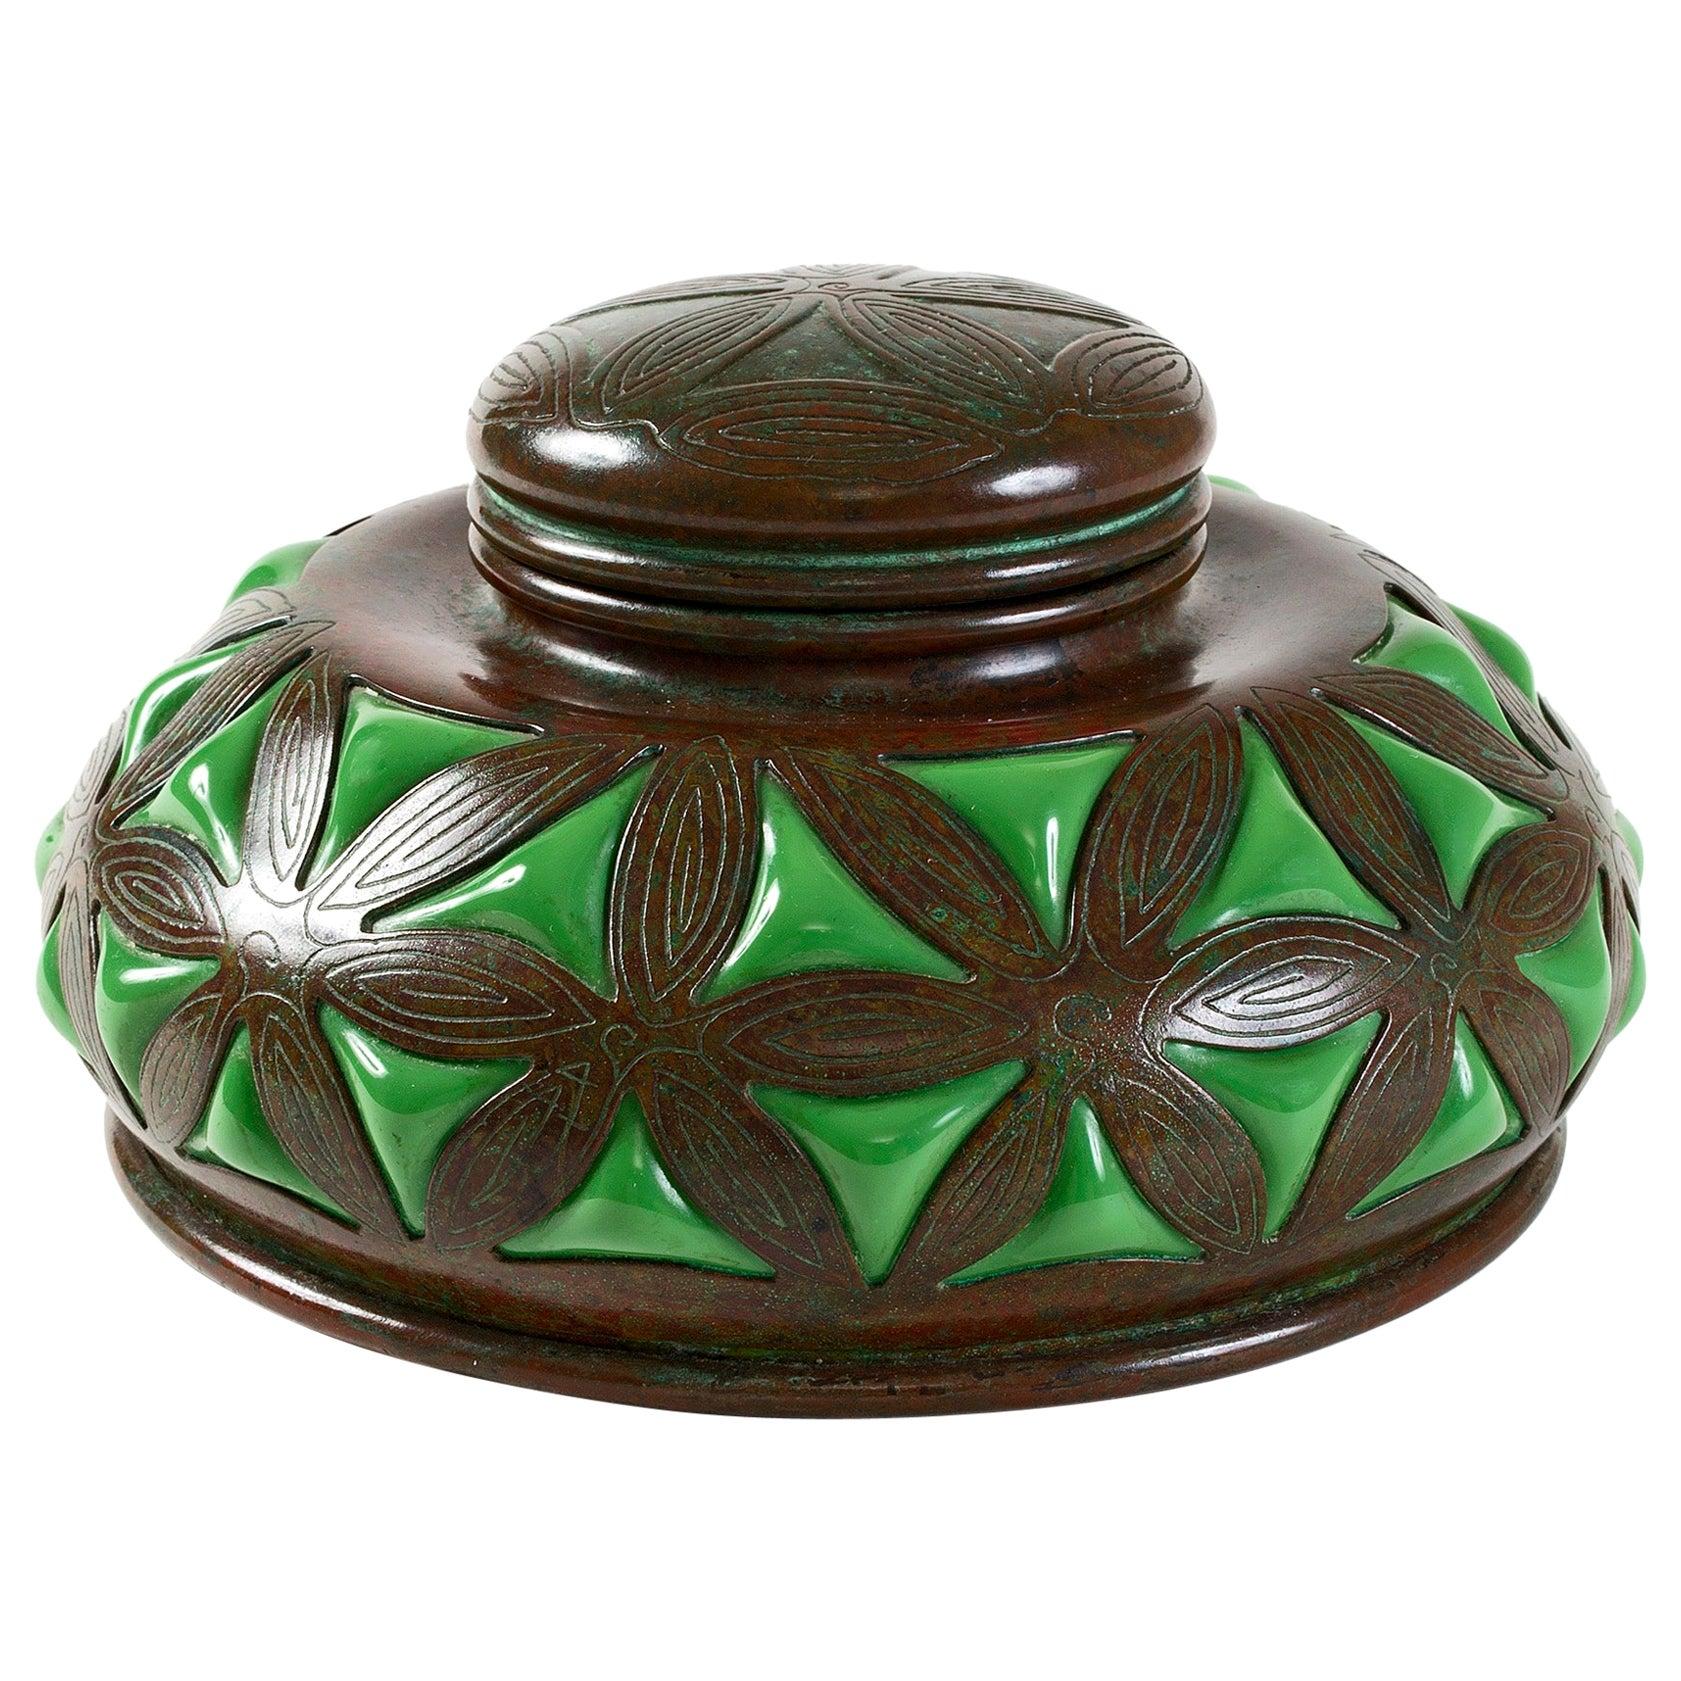 Tiffany Studios New York Bronze and Green Glass Inkwell